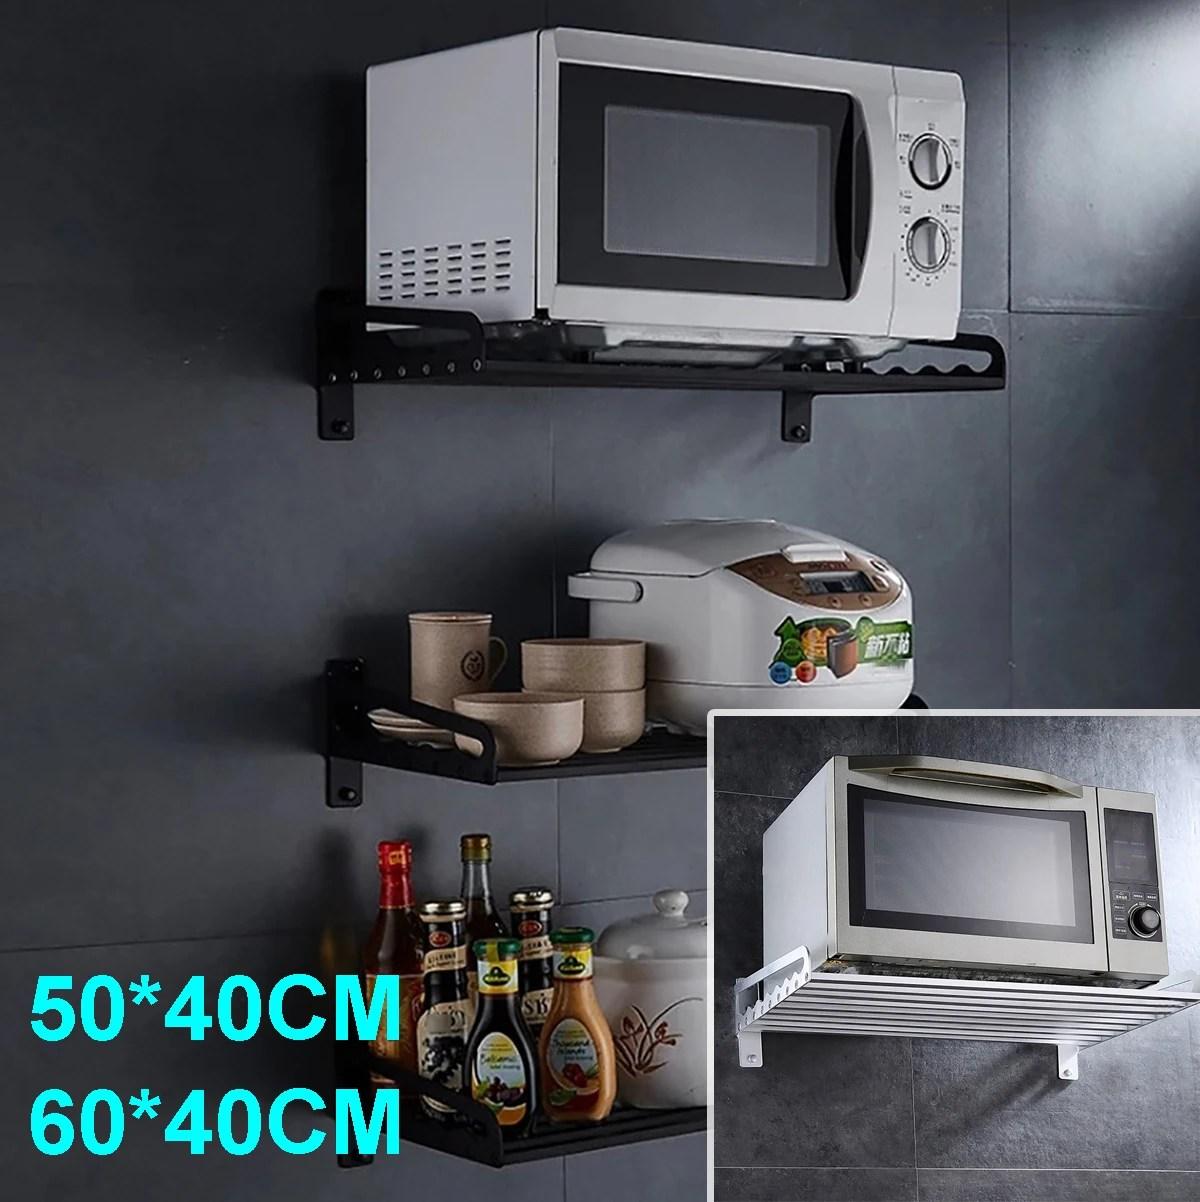 aluminum wall hanging microwave oven stand storage rack shelf kitchen bracket